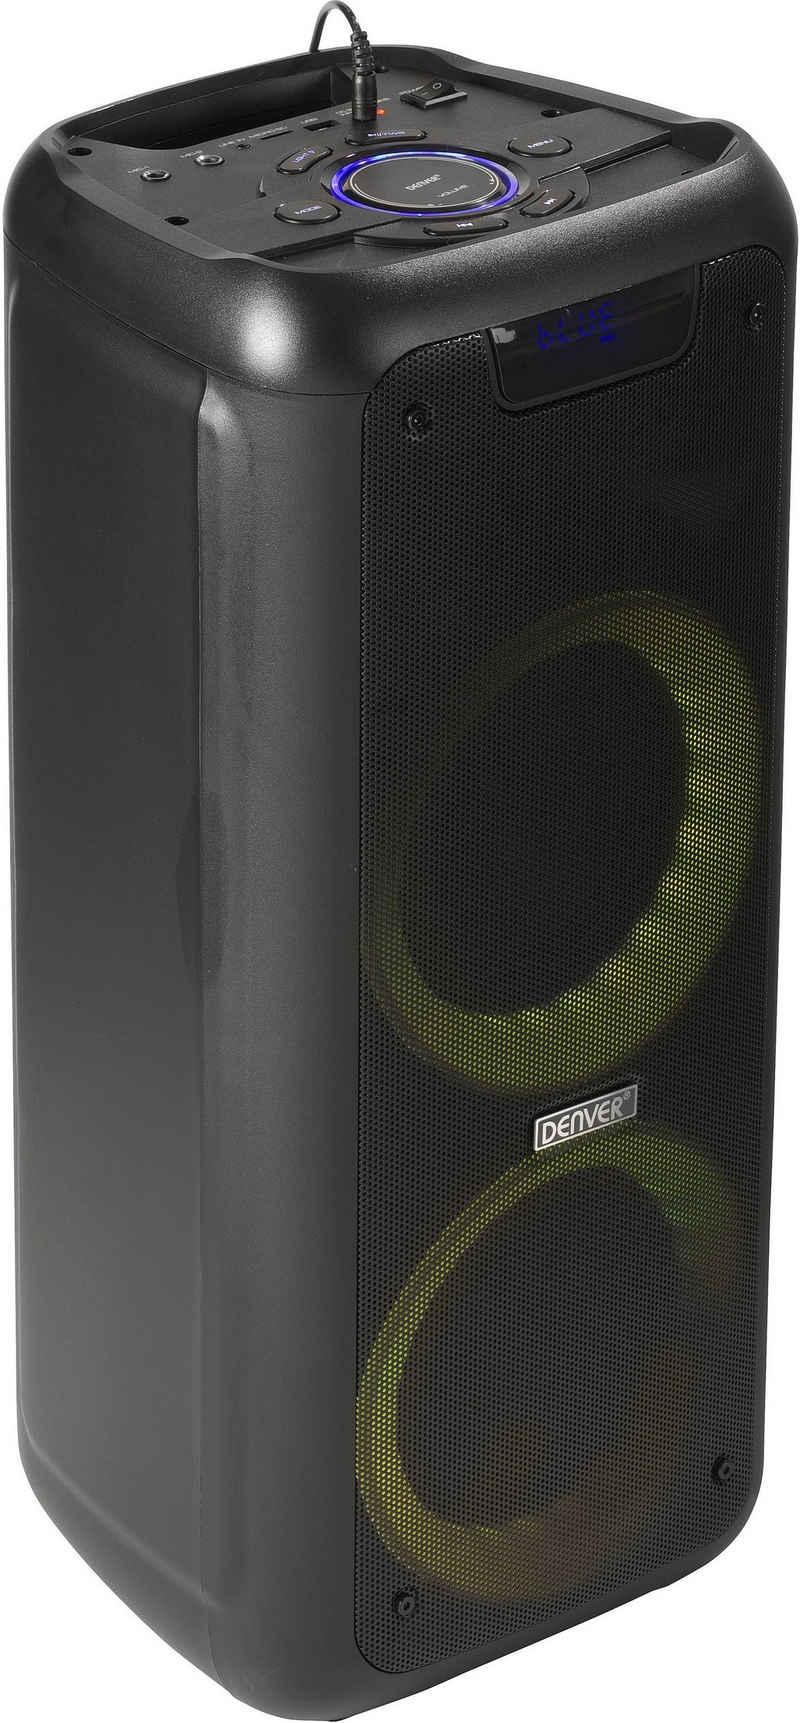 Denver BPS-350 Bluetooth-Lautsprecher (Bluetooth, 25 W)